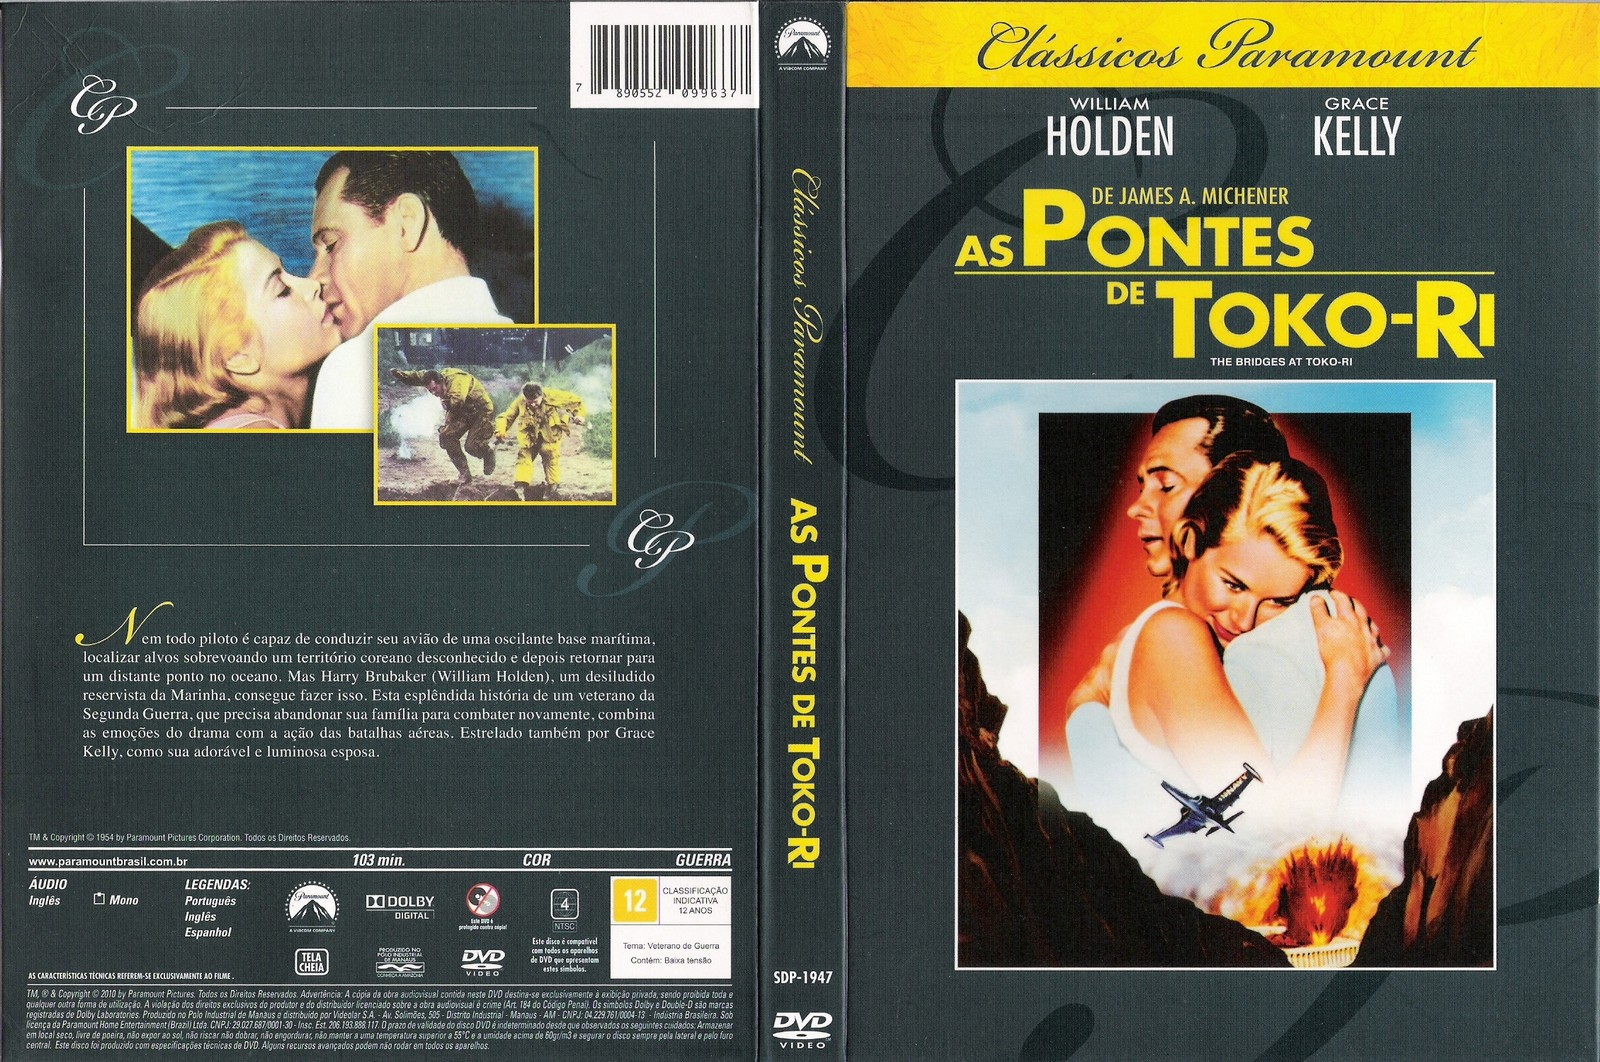 http://1.bp.blogspot.com/-4pziu56piJc/TWuhw52opFI/AAAAAAAAAVw/iKaWXRKNzfo/s1600/As-Pontes-De-Toko-Ri.jpg